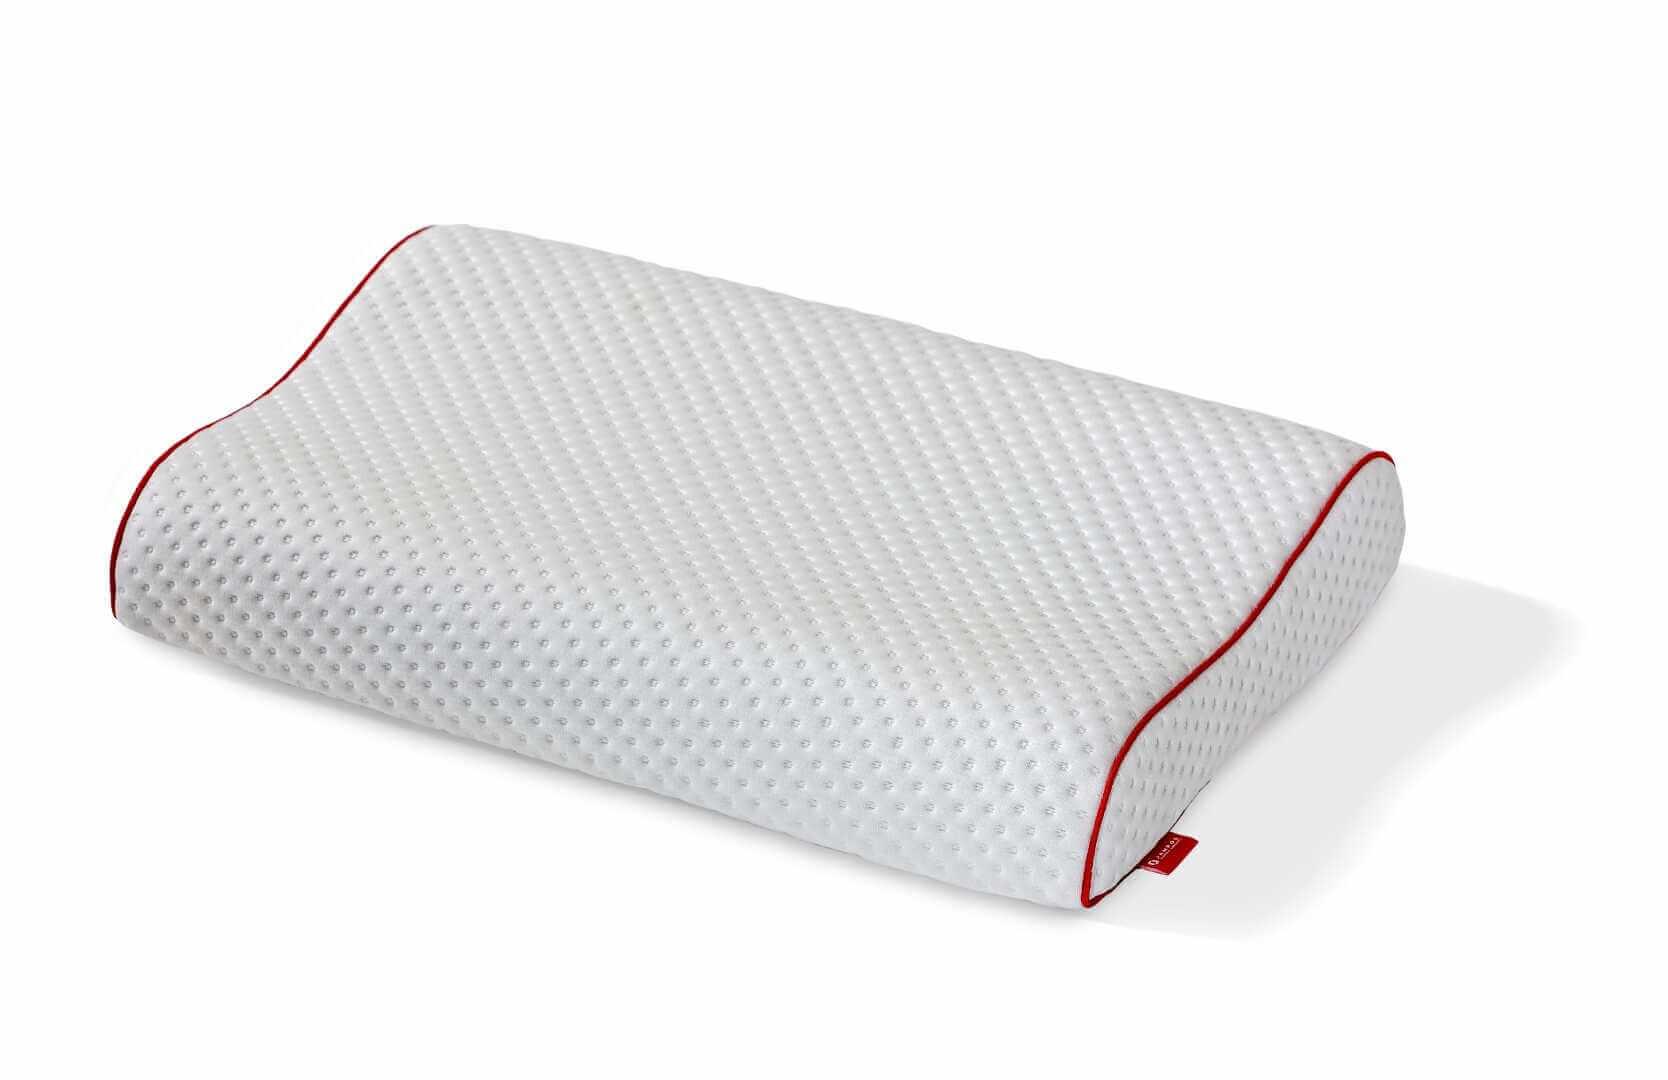 Poduszka Smart Latex profilowana